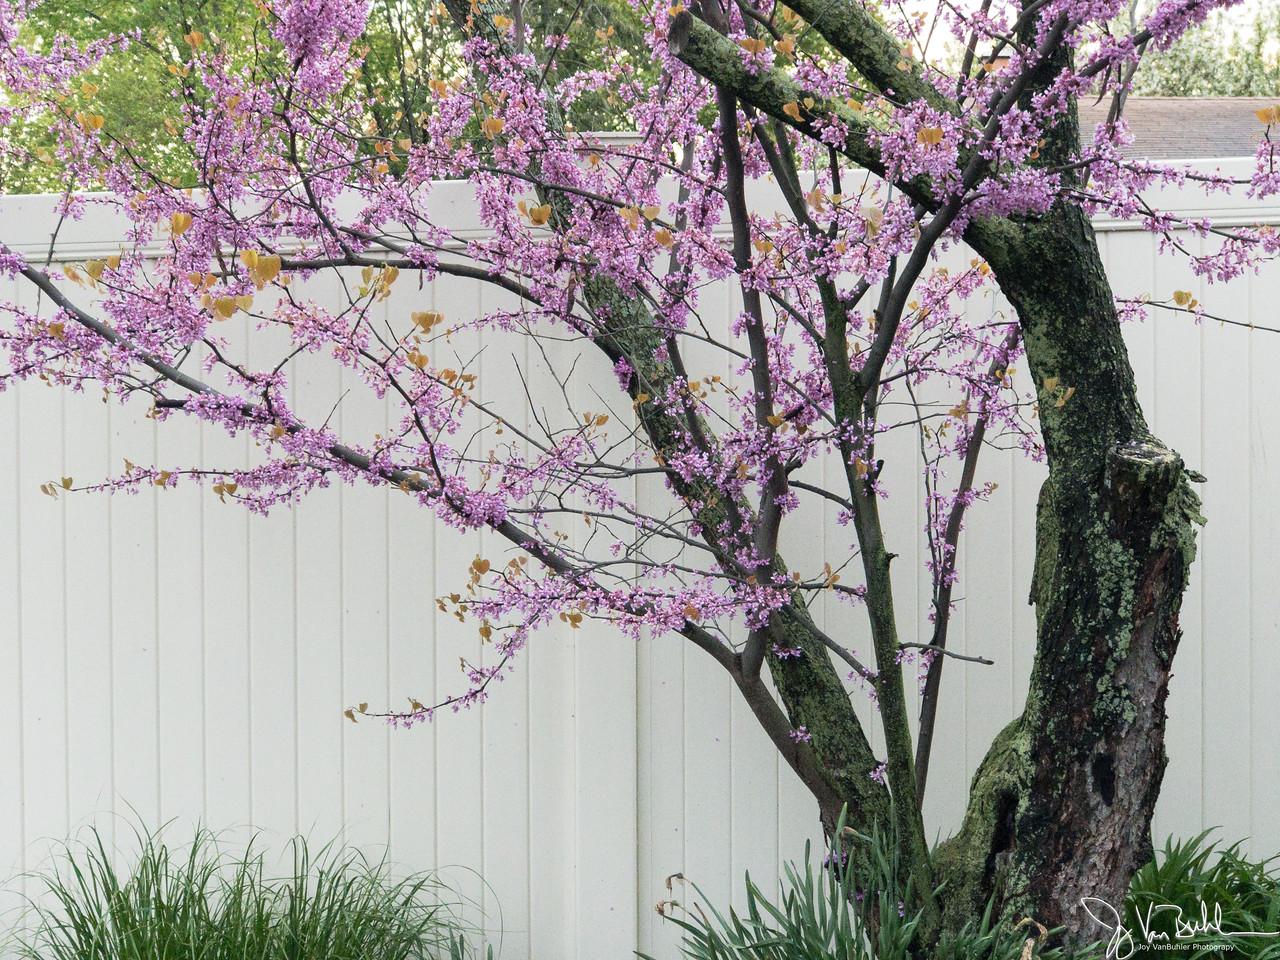 125/365 - Redbud Tree